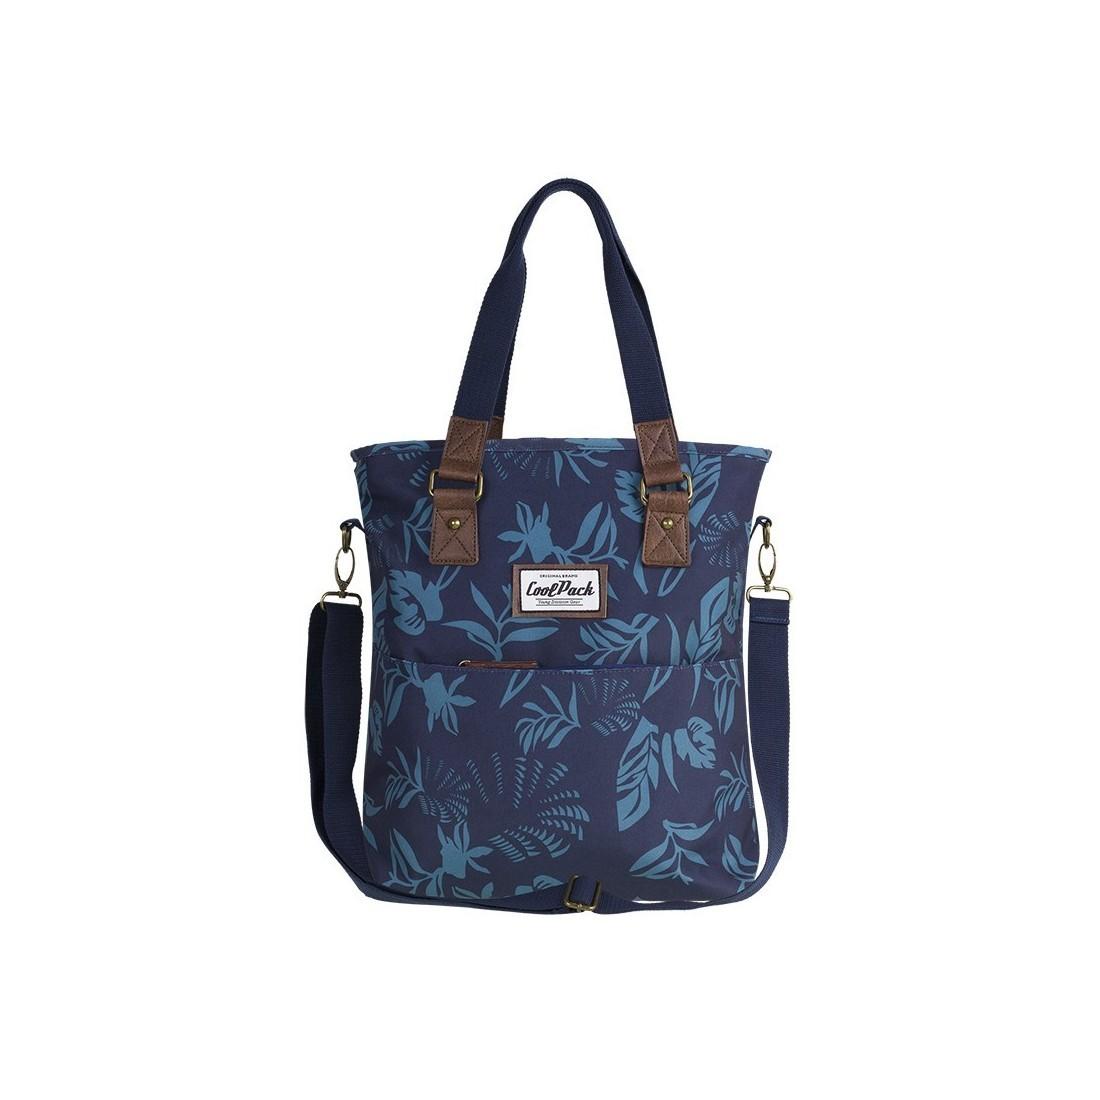 Torba damska na ramię CoolPack CP AMBER BLUE DUSK niebieska liście - A089